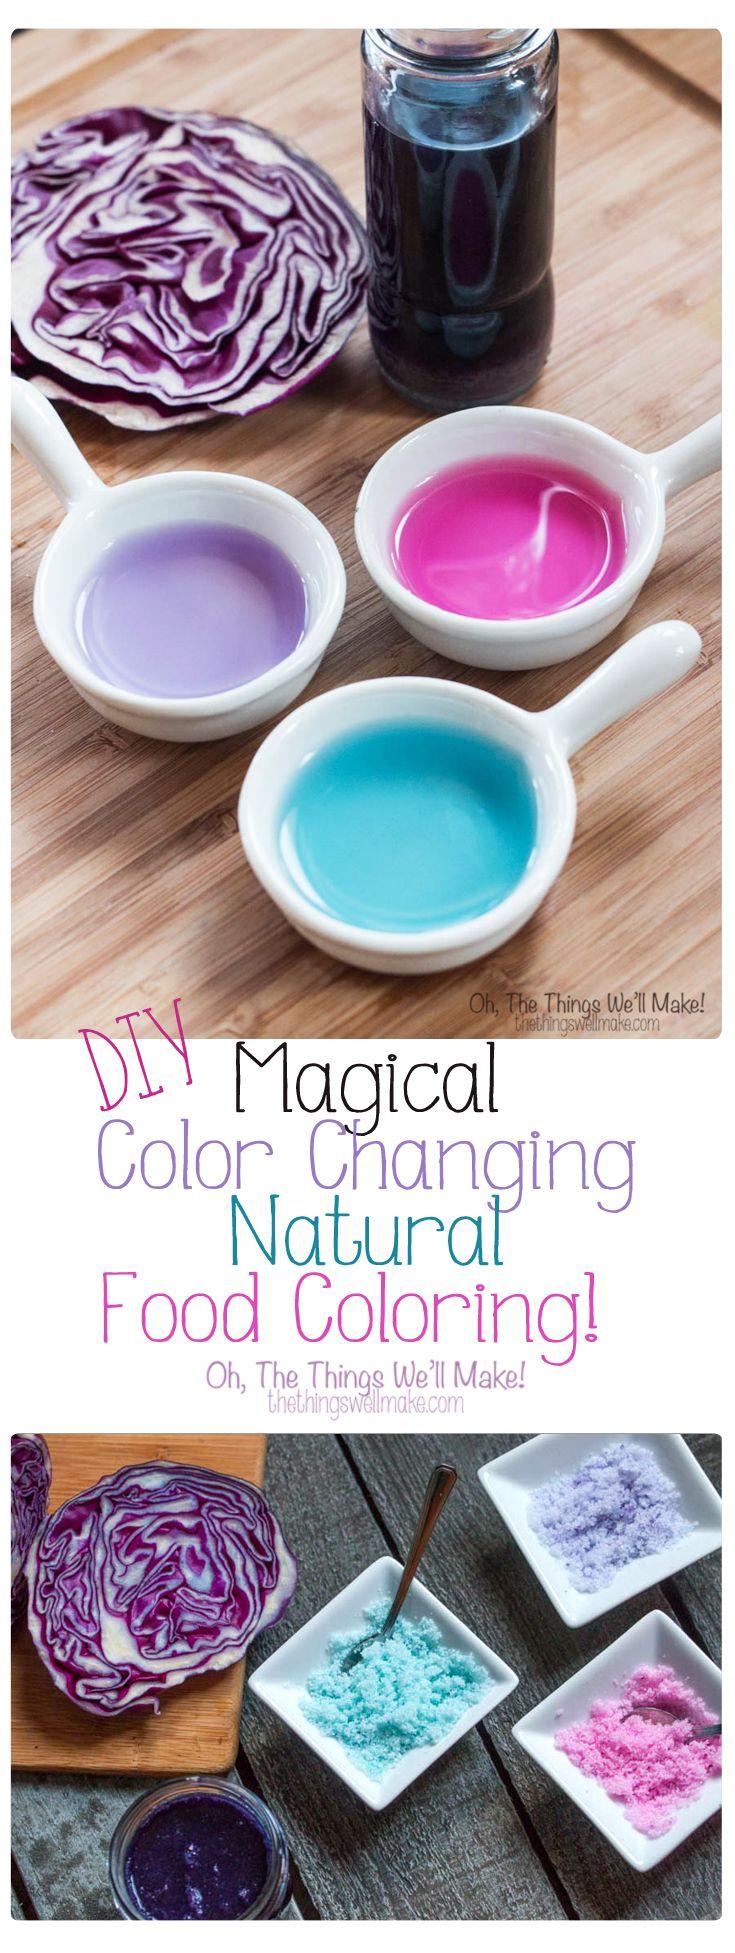 Diy magical color changing food coloring recipe